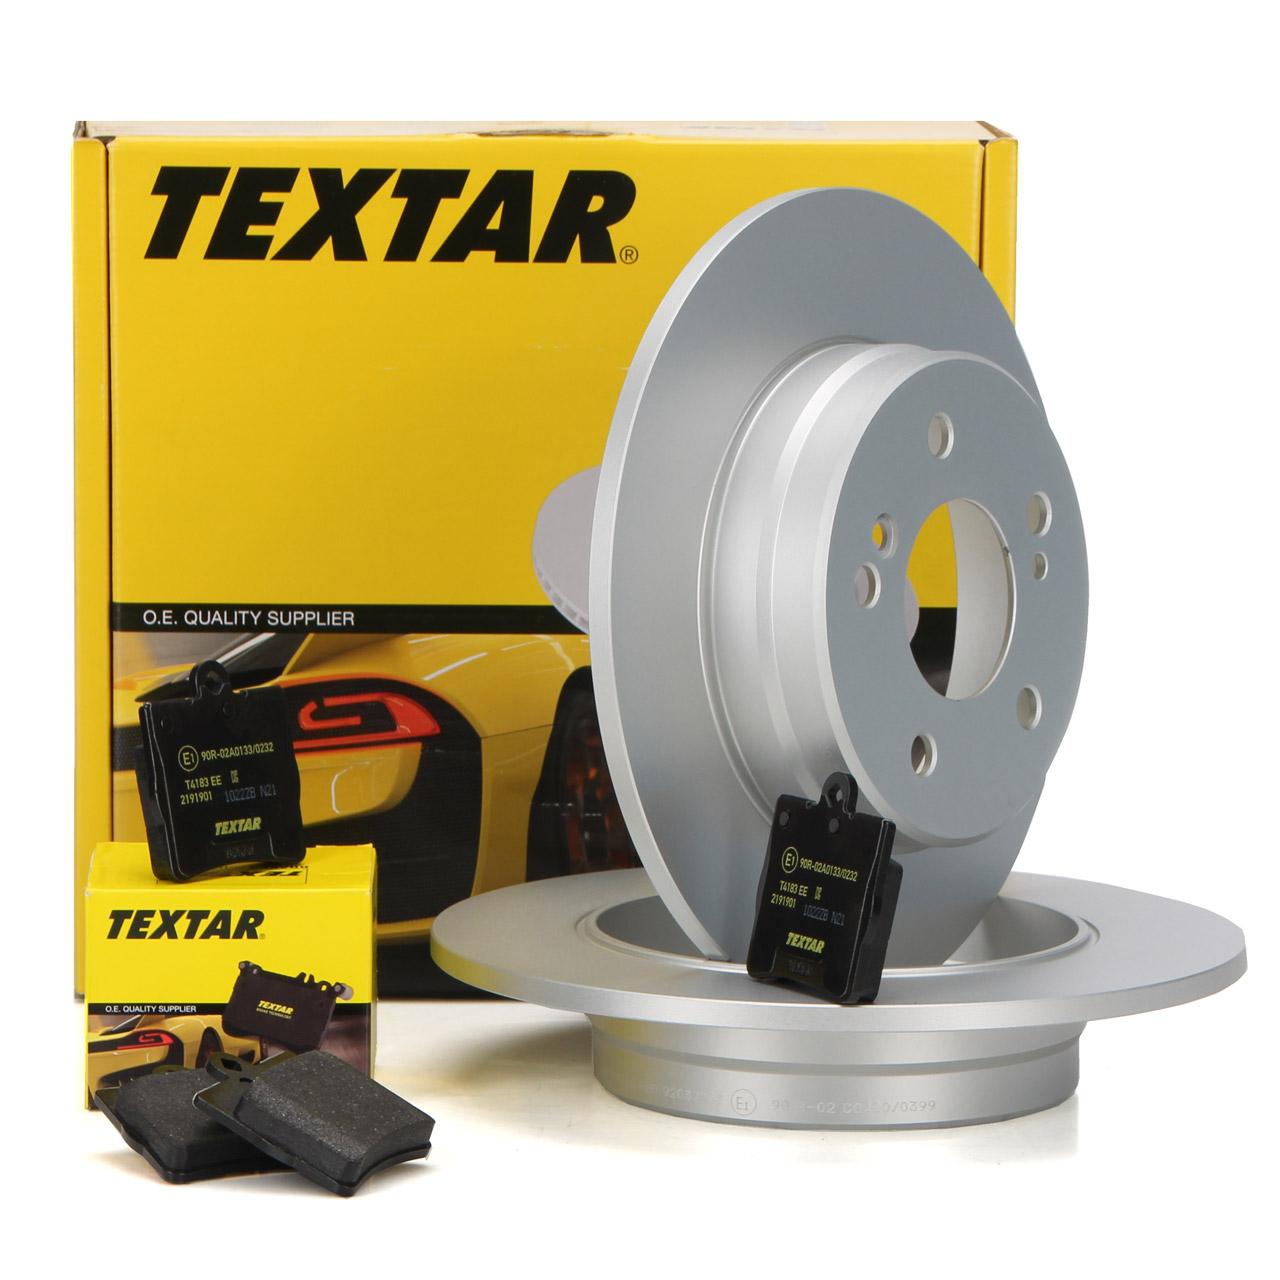 TEXTAR Bremsscheiben + Beläge MERCEDES C-Klasse W203 CL203 CLK C209 SLK R171 hinten